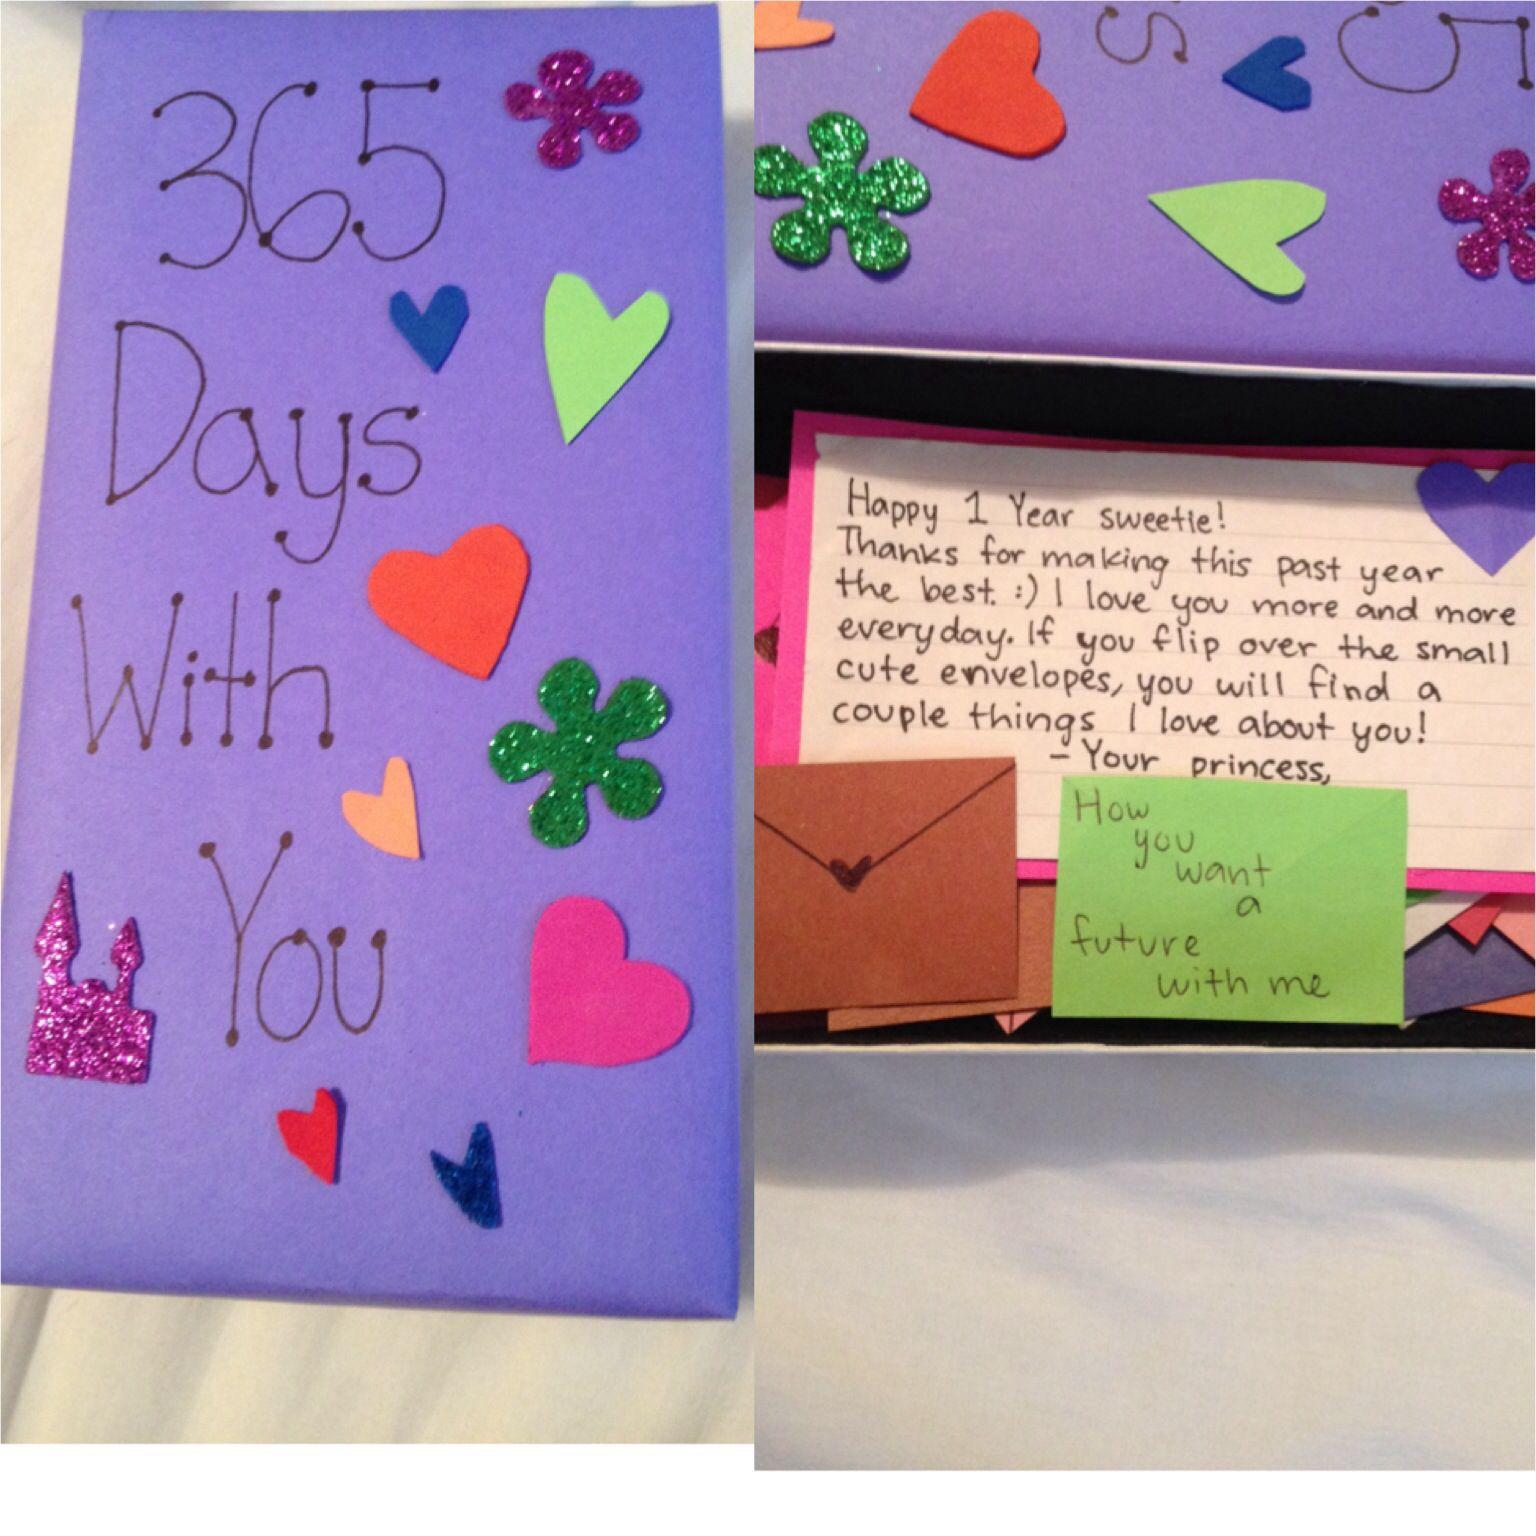 1 Year Anniversary Gift For My Boyfriend That I Made Gifts For My Boyfriend Anniversary Gifts 1 Year Anniversary Gifts